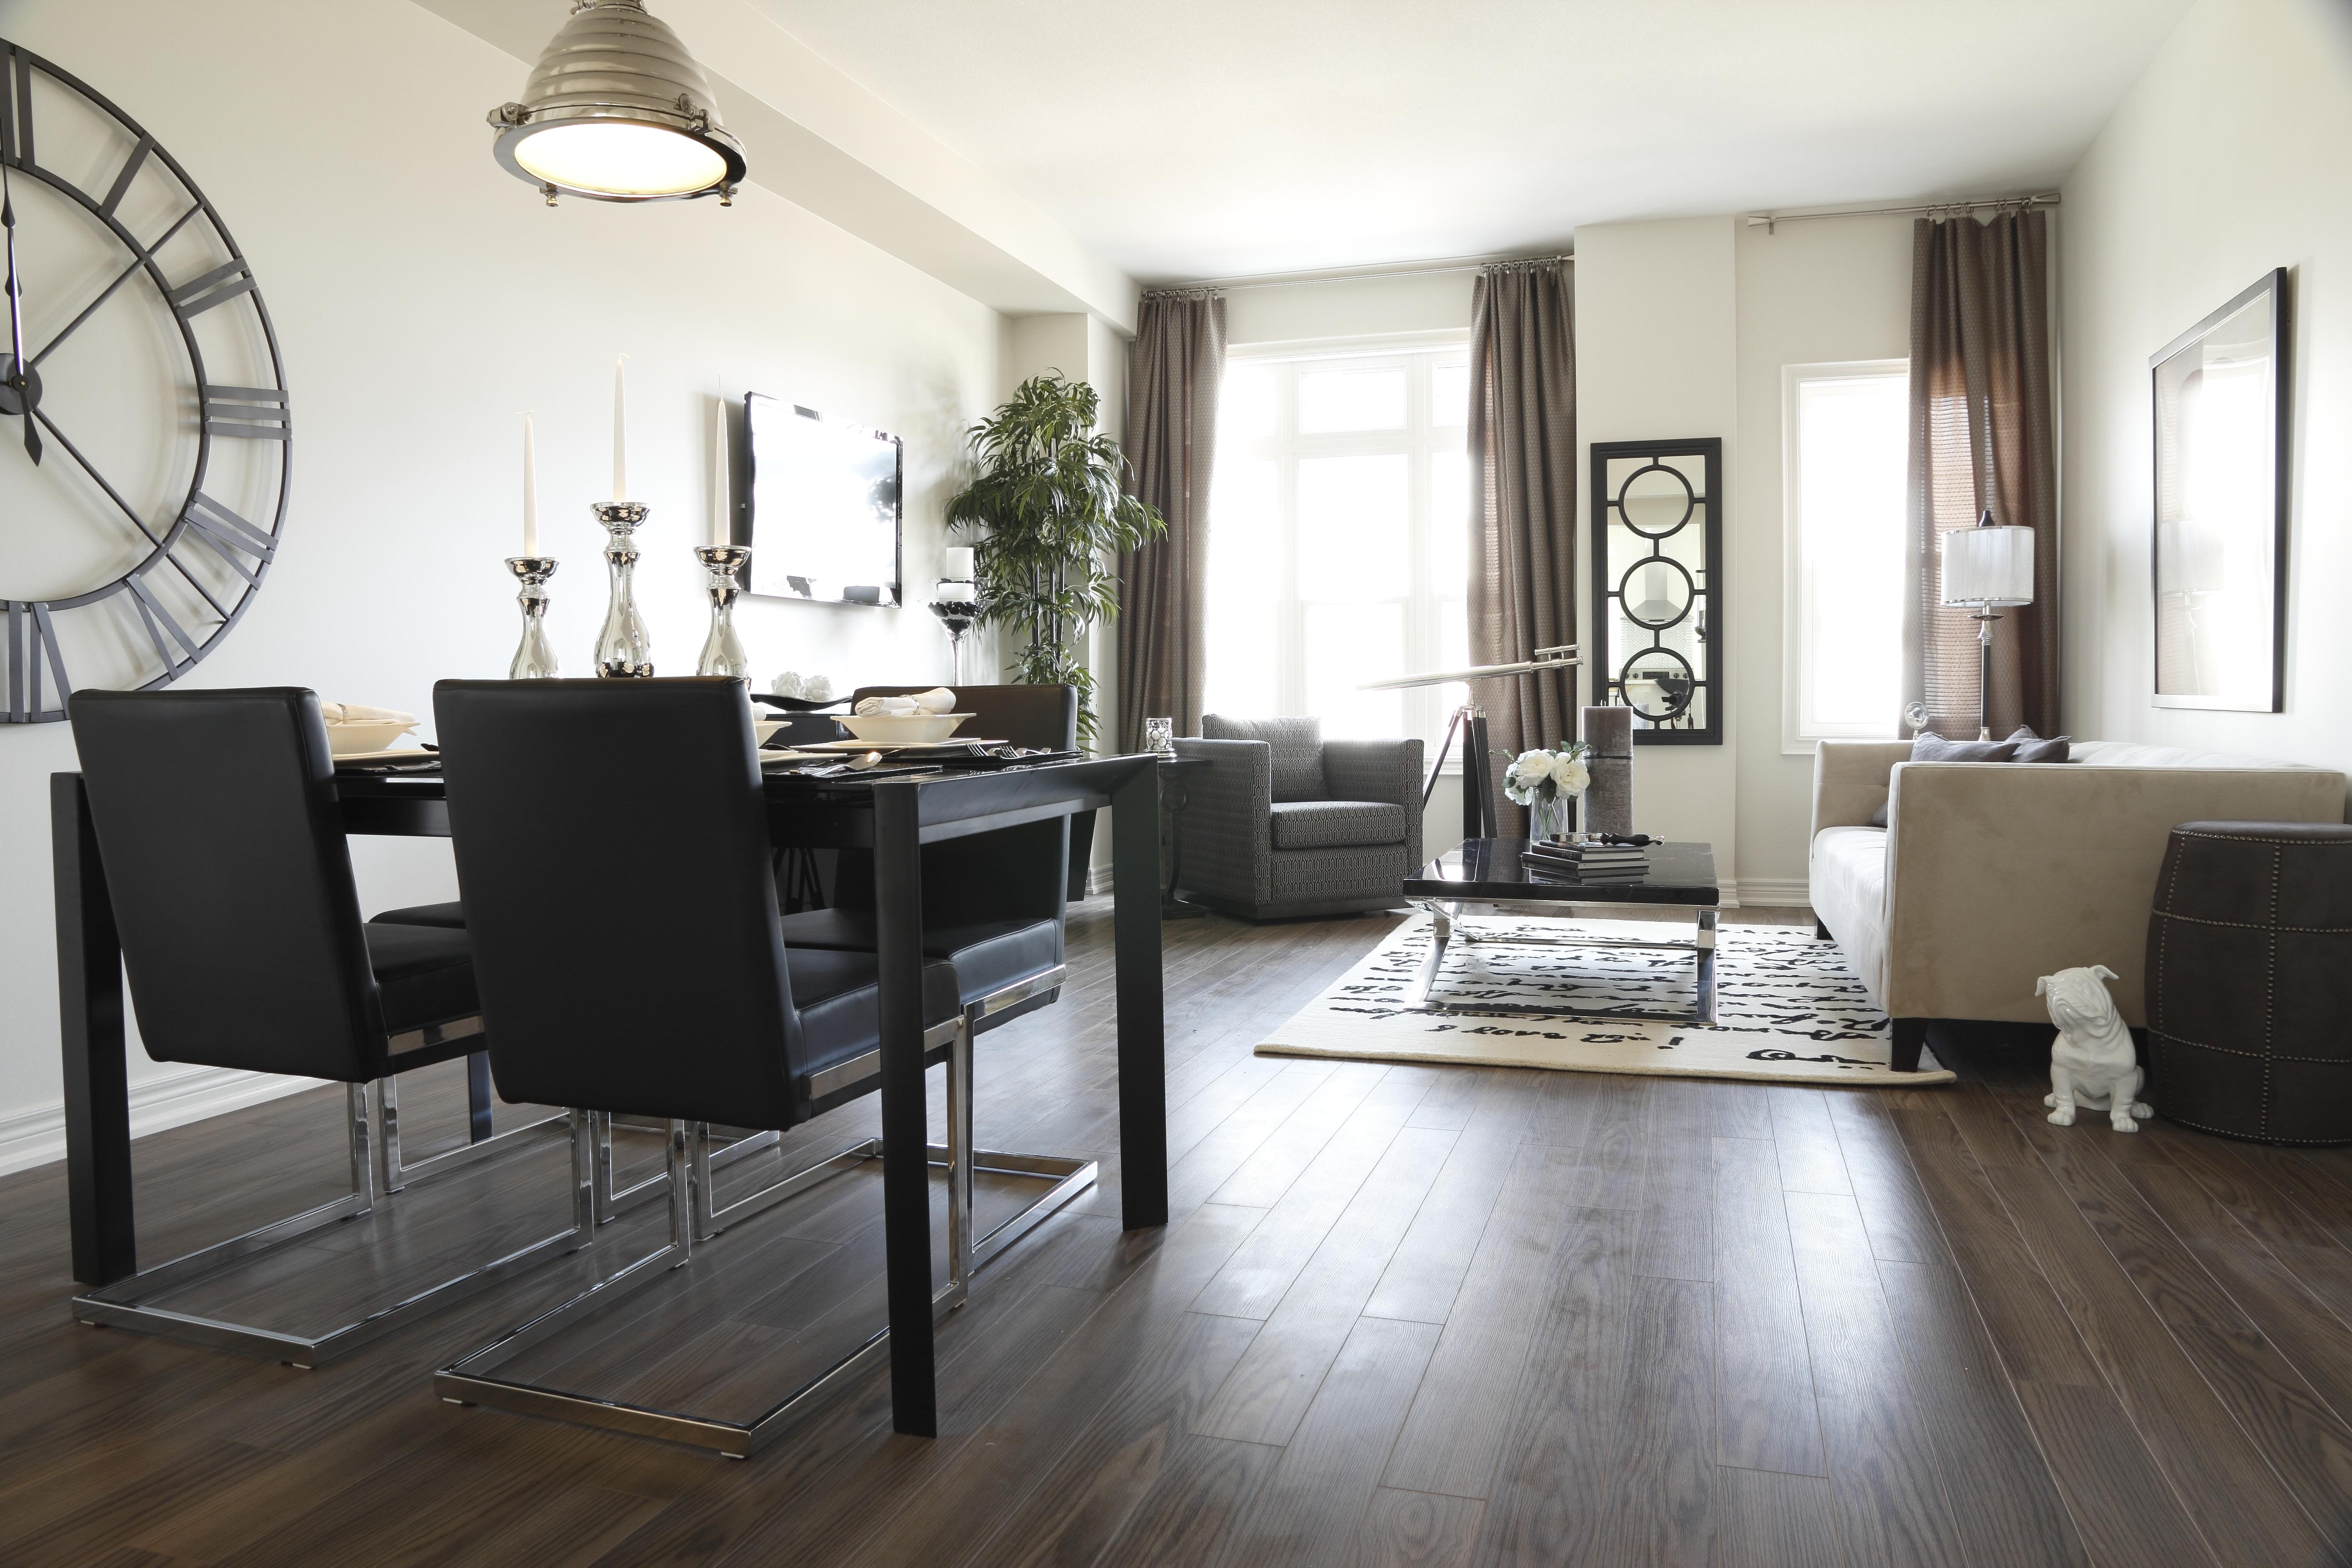 Carlisle Residence, Great room